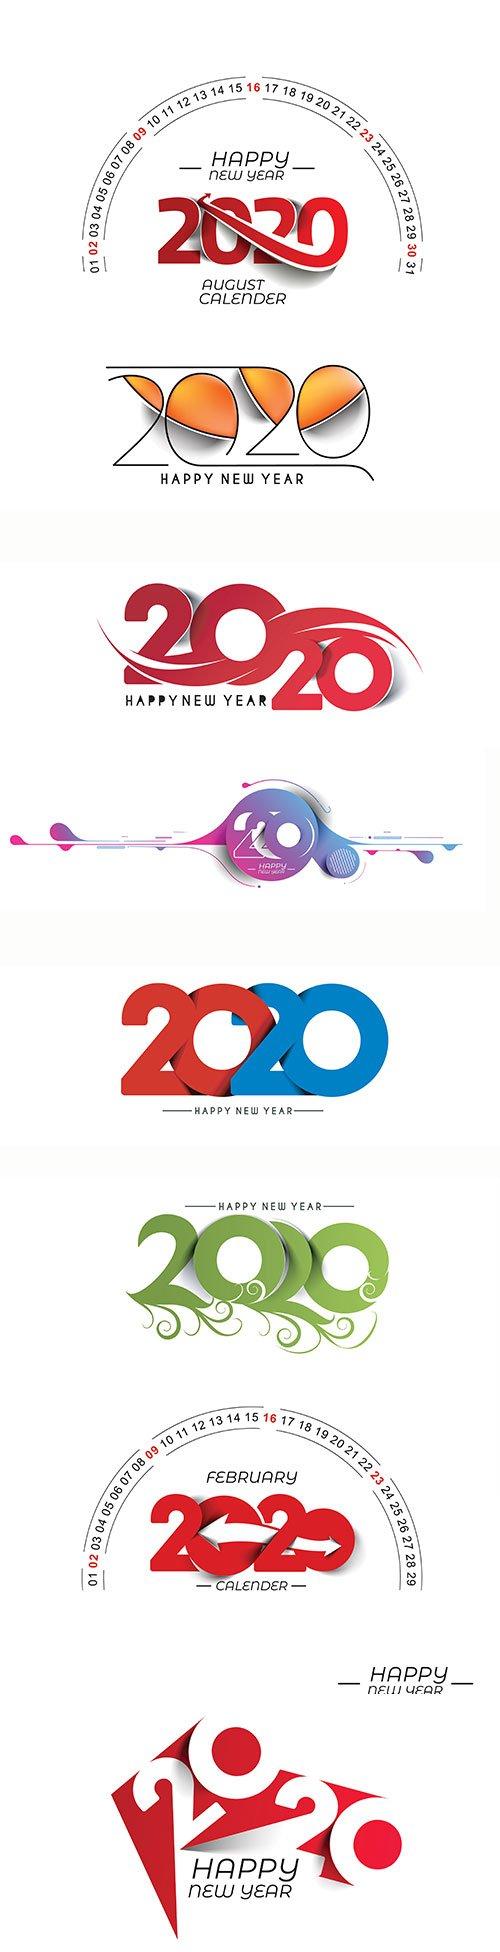 Happy New Year 2020 text design vector illustration